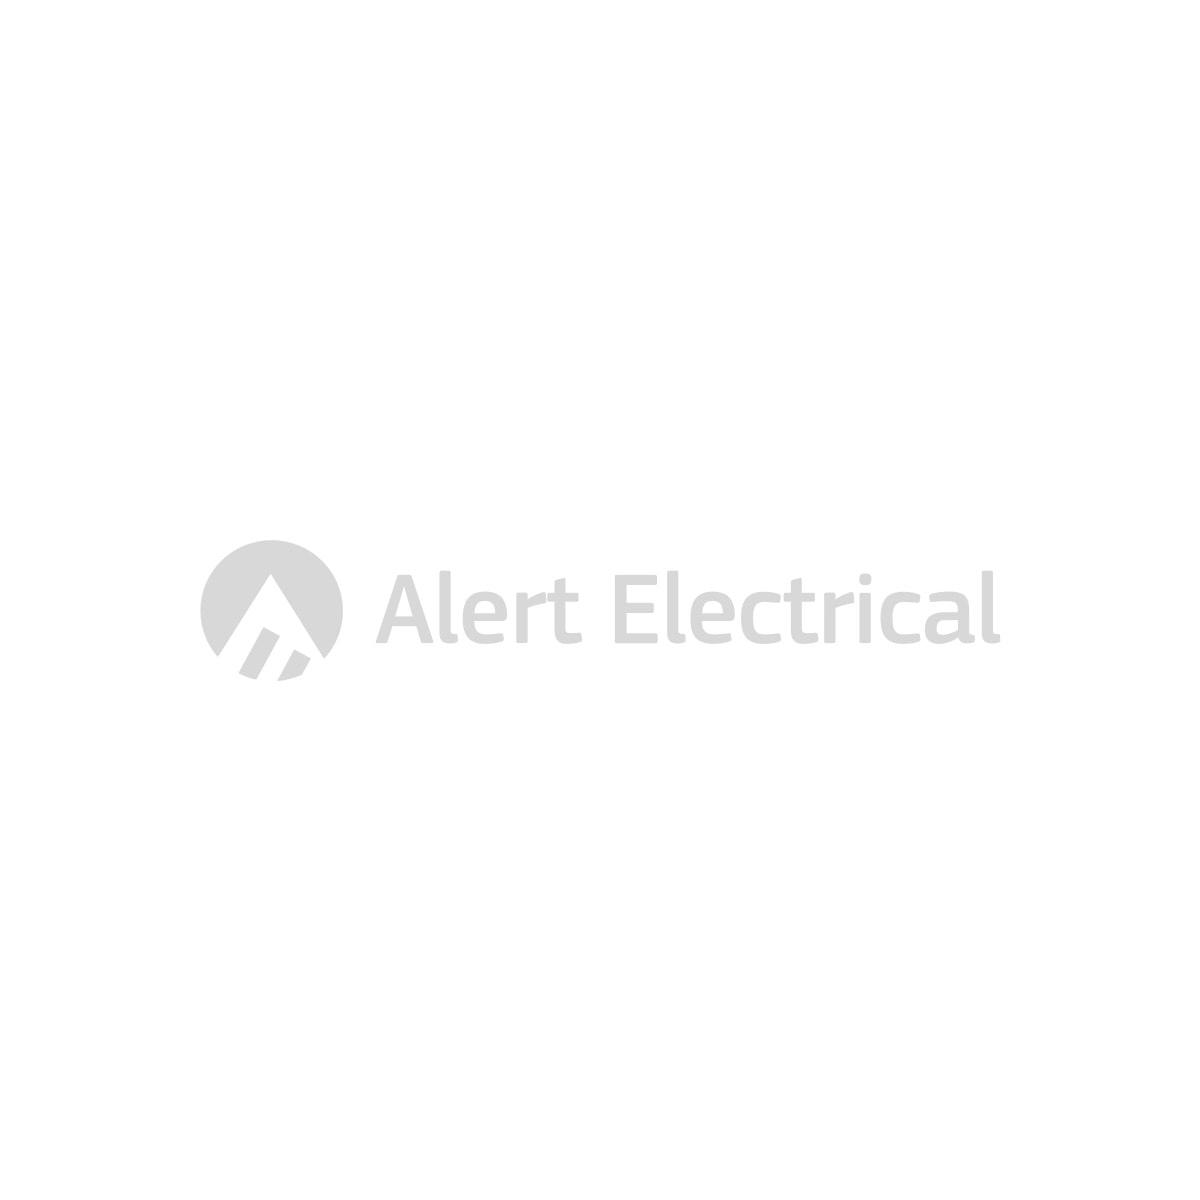 Atlantic Galapagos 1500W Electric Thermofluid Radiator AH500615 Placeholder